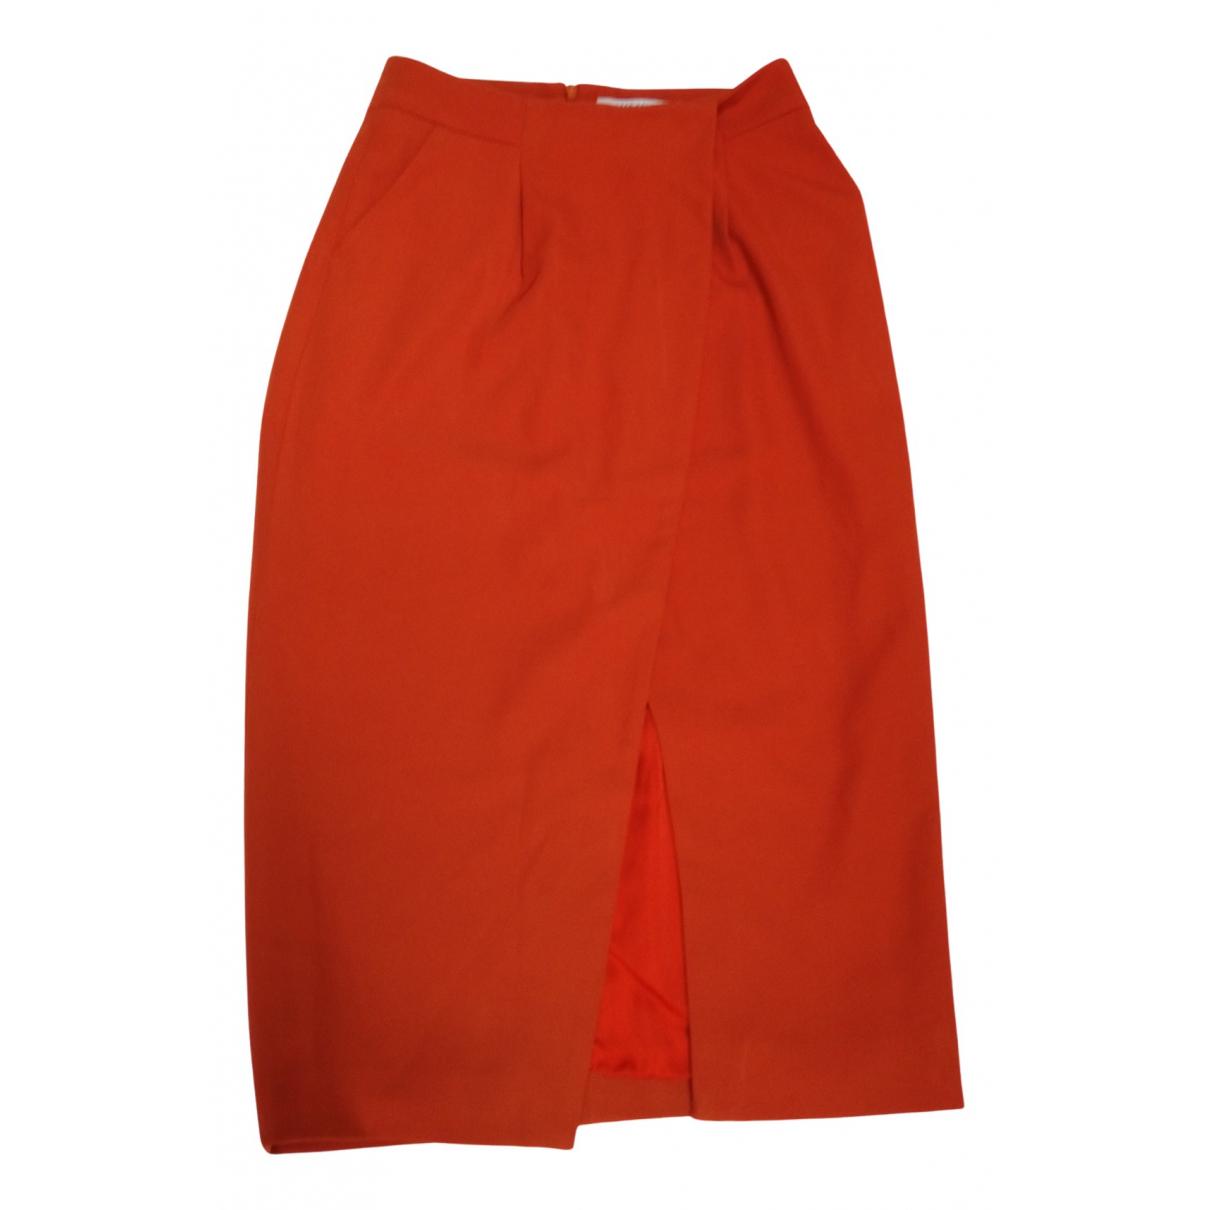 Finders Keepers - Jupe   pour femme - orange